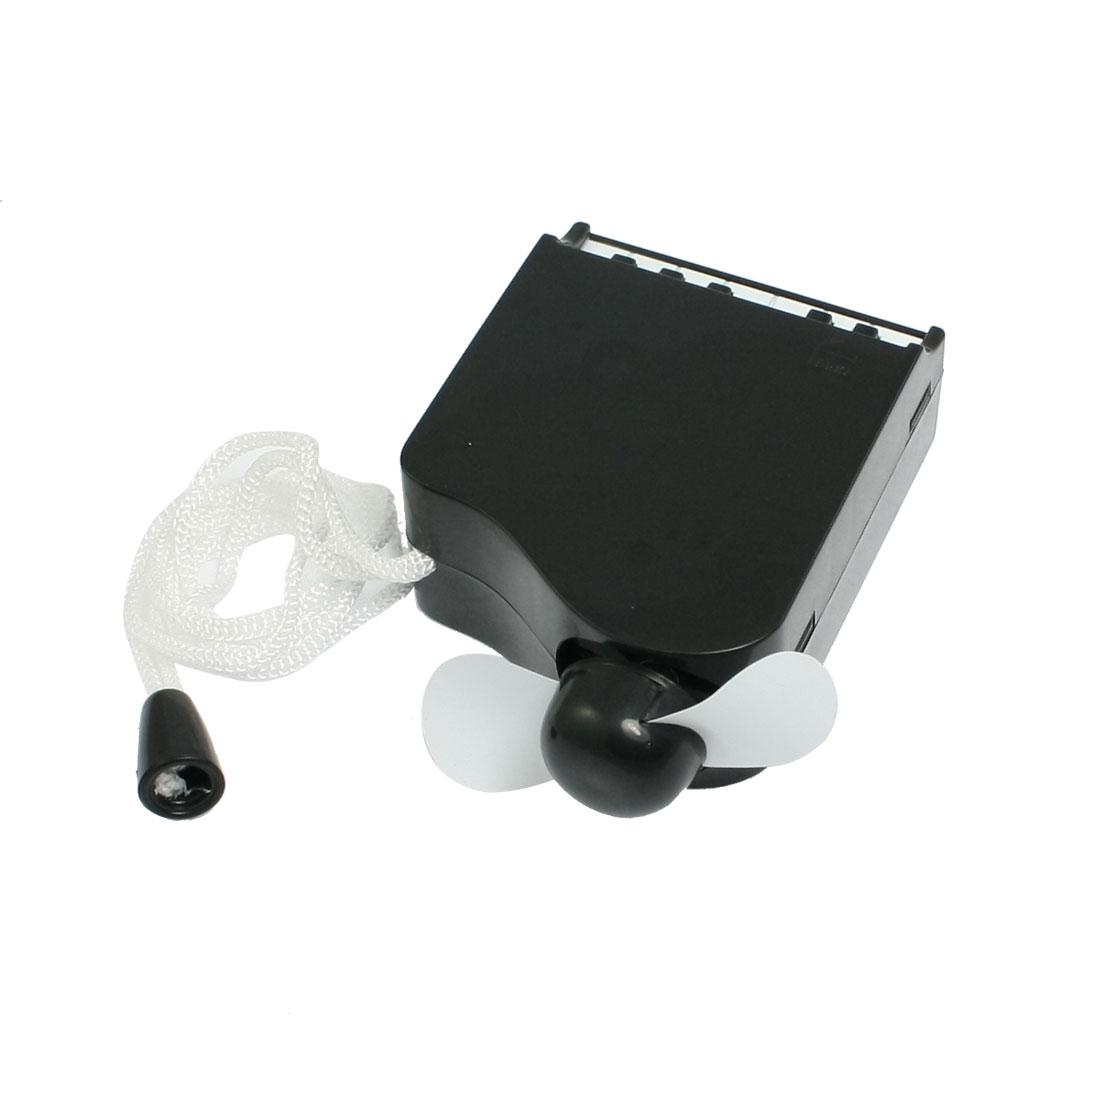 Battery Power Black Plastic Piano Shaped Neck Strap Cooler Mini Fan